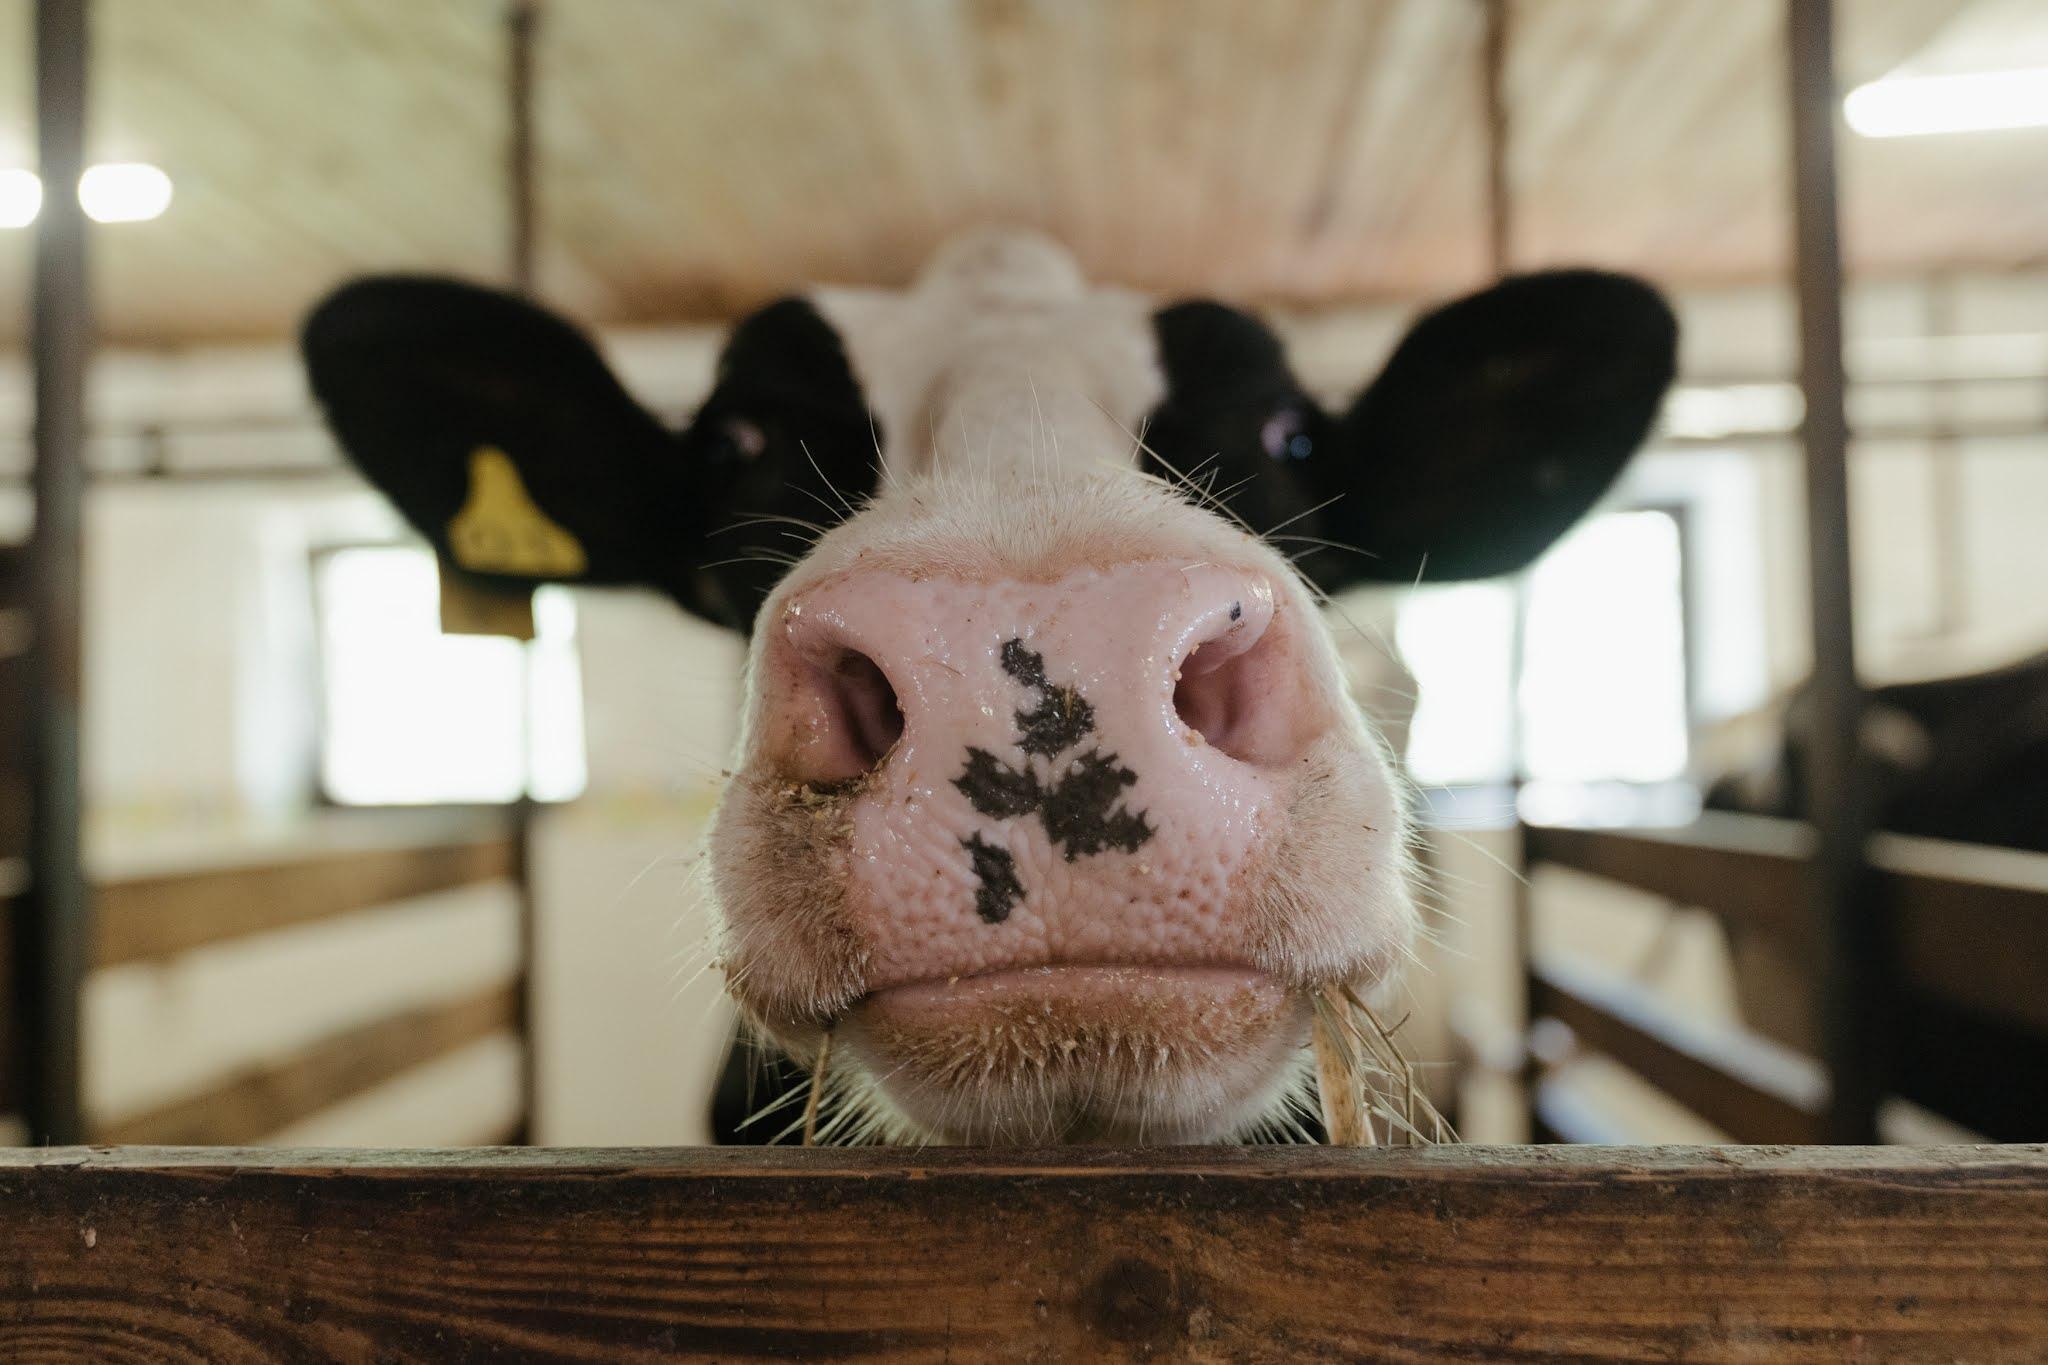 cow essay in Hindi